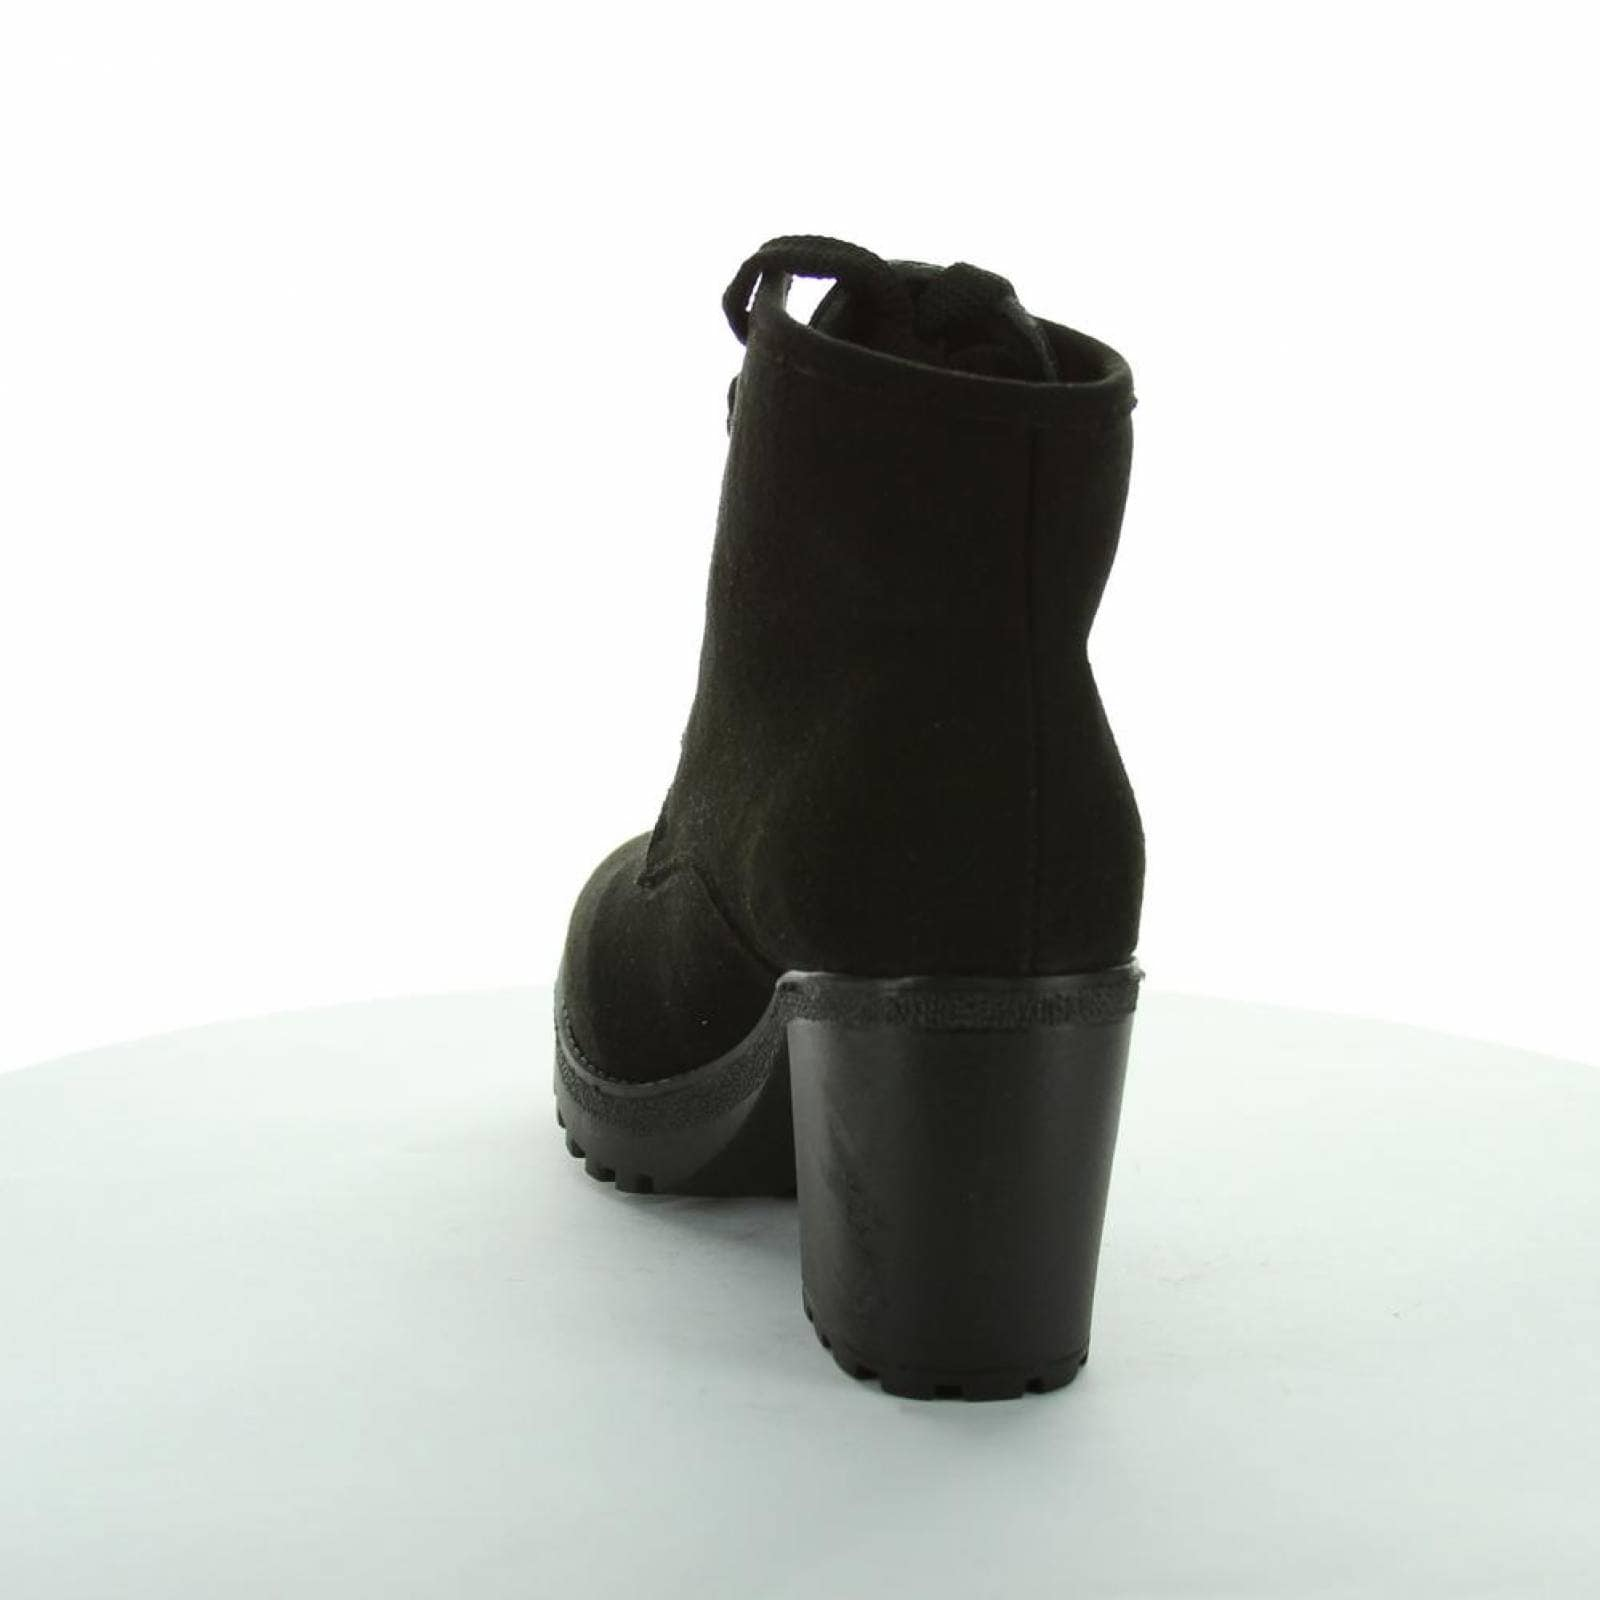 Botín Moda Mujer Salvaje Tentación Negro 09903100 Tipo Ante